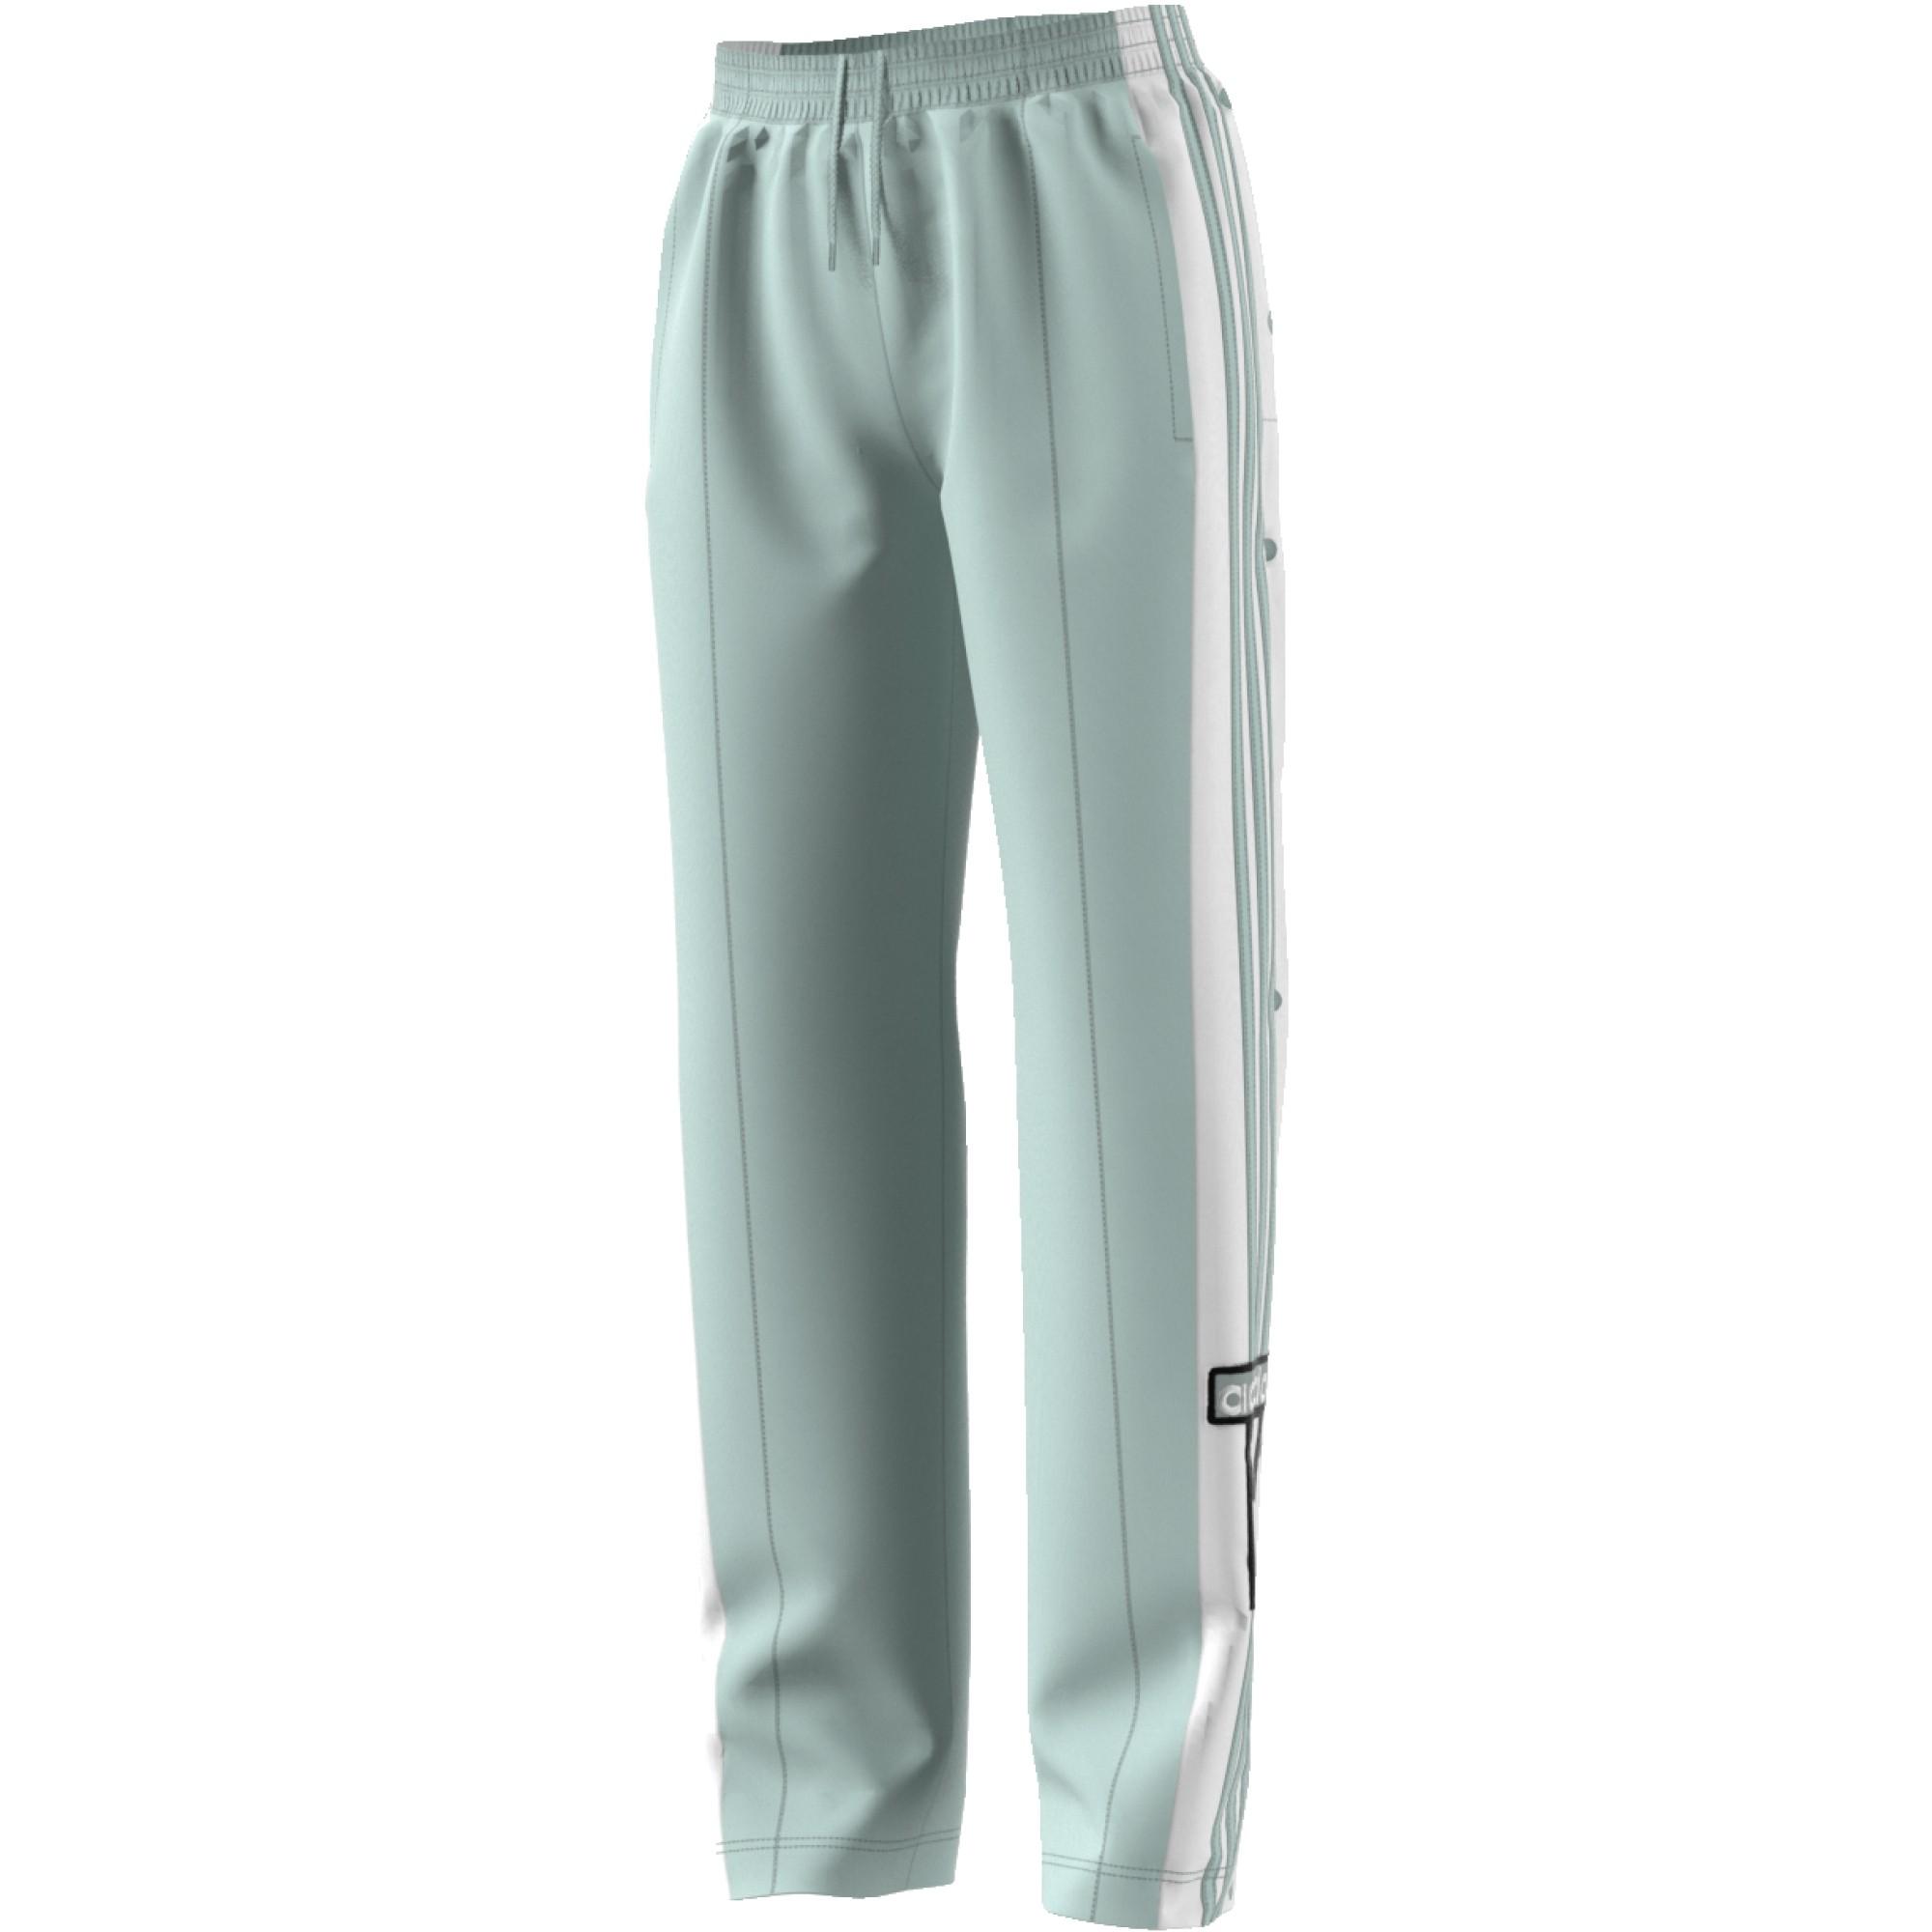 d79b828bc6 Pantalón Adidas Adibreak Azul Claro Mujer - Deportes Moya